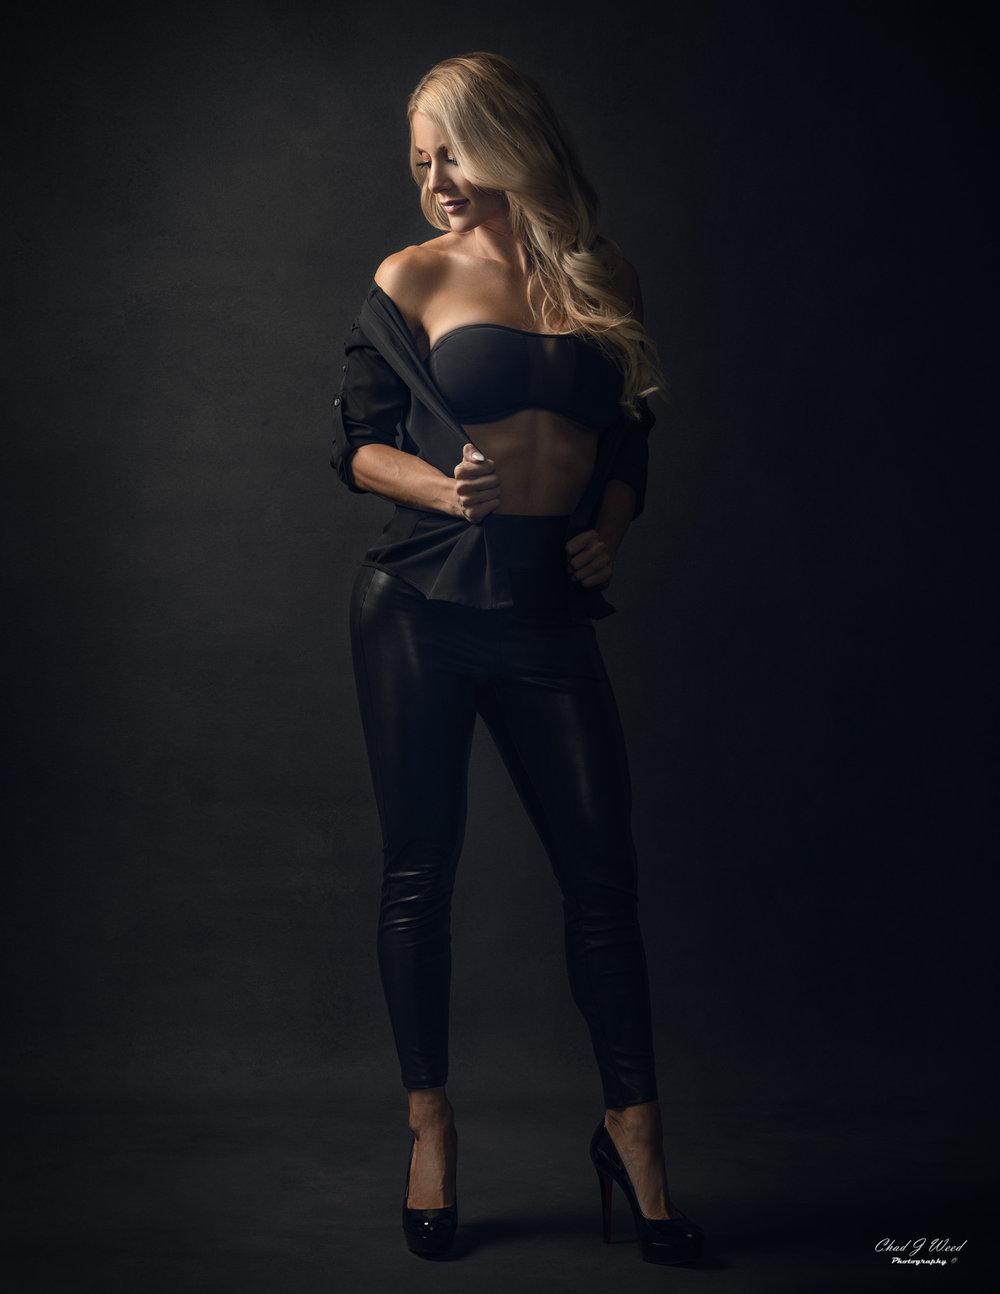 Mesa Arizona Fashion Photographer Chad Weed with Fashion Model Kristi - 3